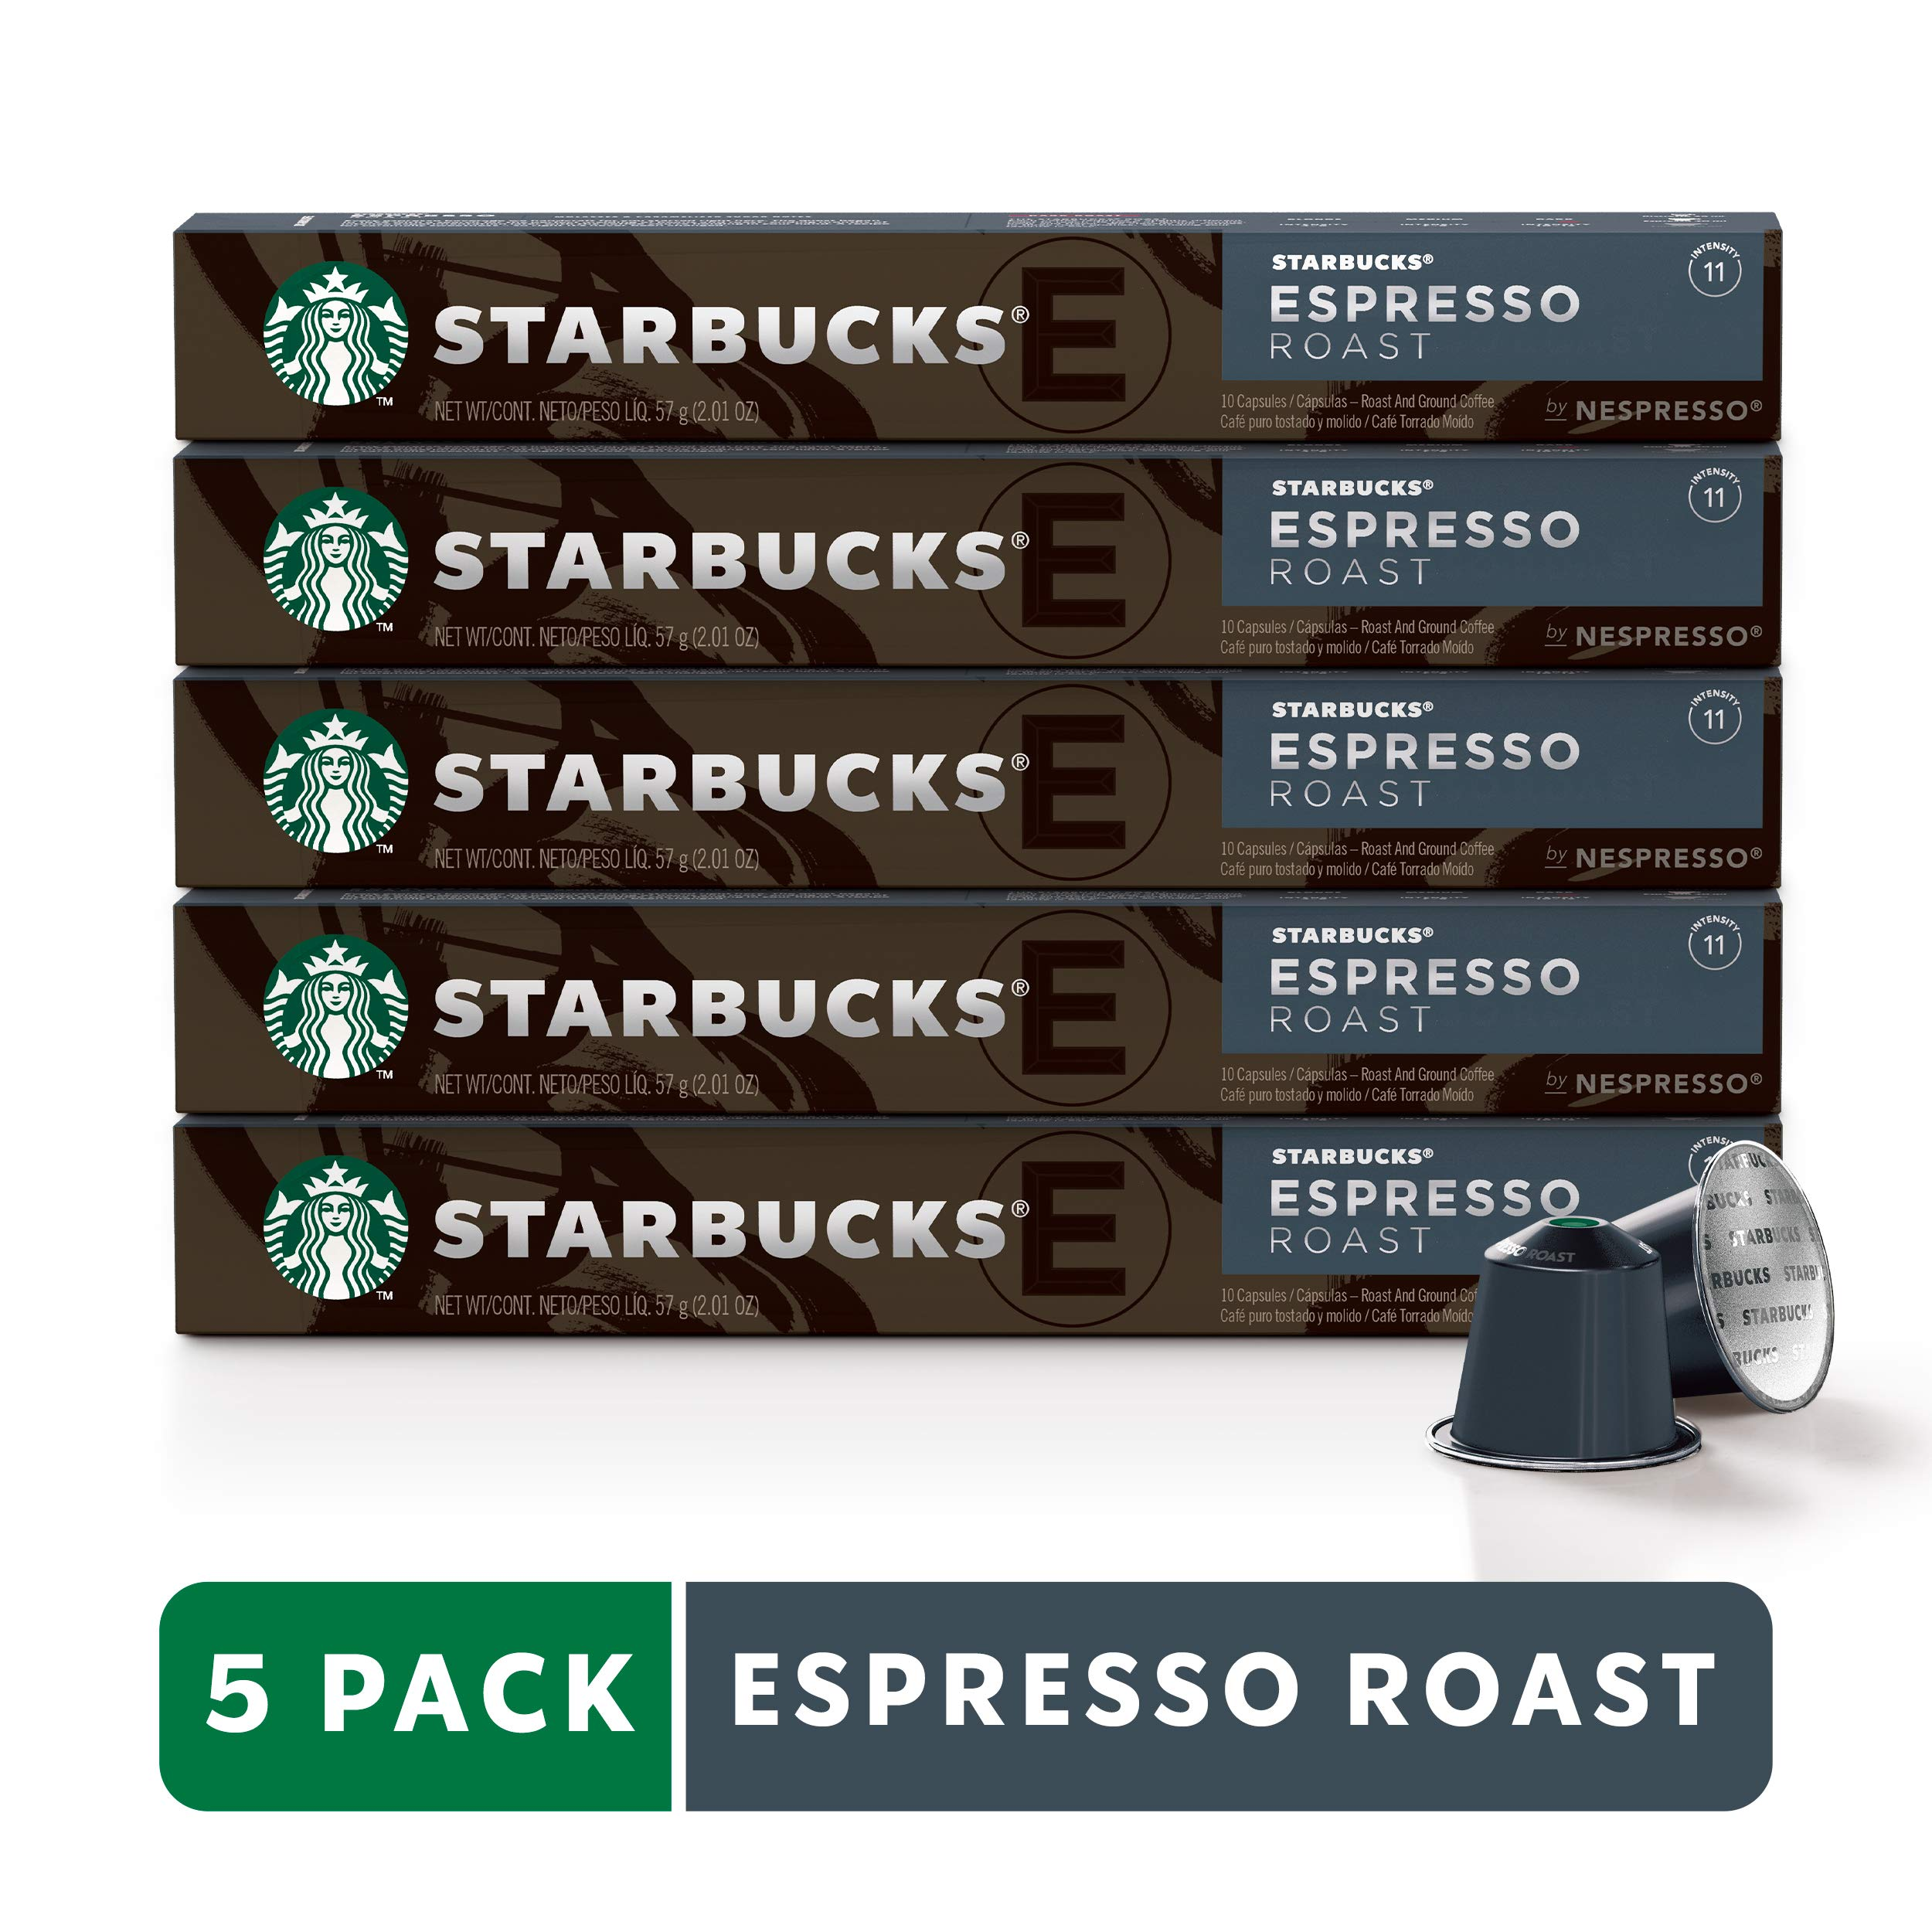 Starbucks by Nespresso, Espresso Dark Roast (50-count single serve capsules, compatible with Nespresso Original Line System) by Starbucks for Nespresso (Image #1)